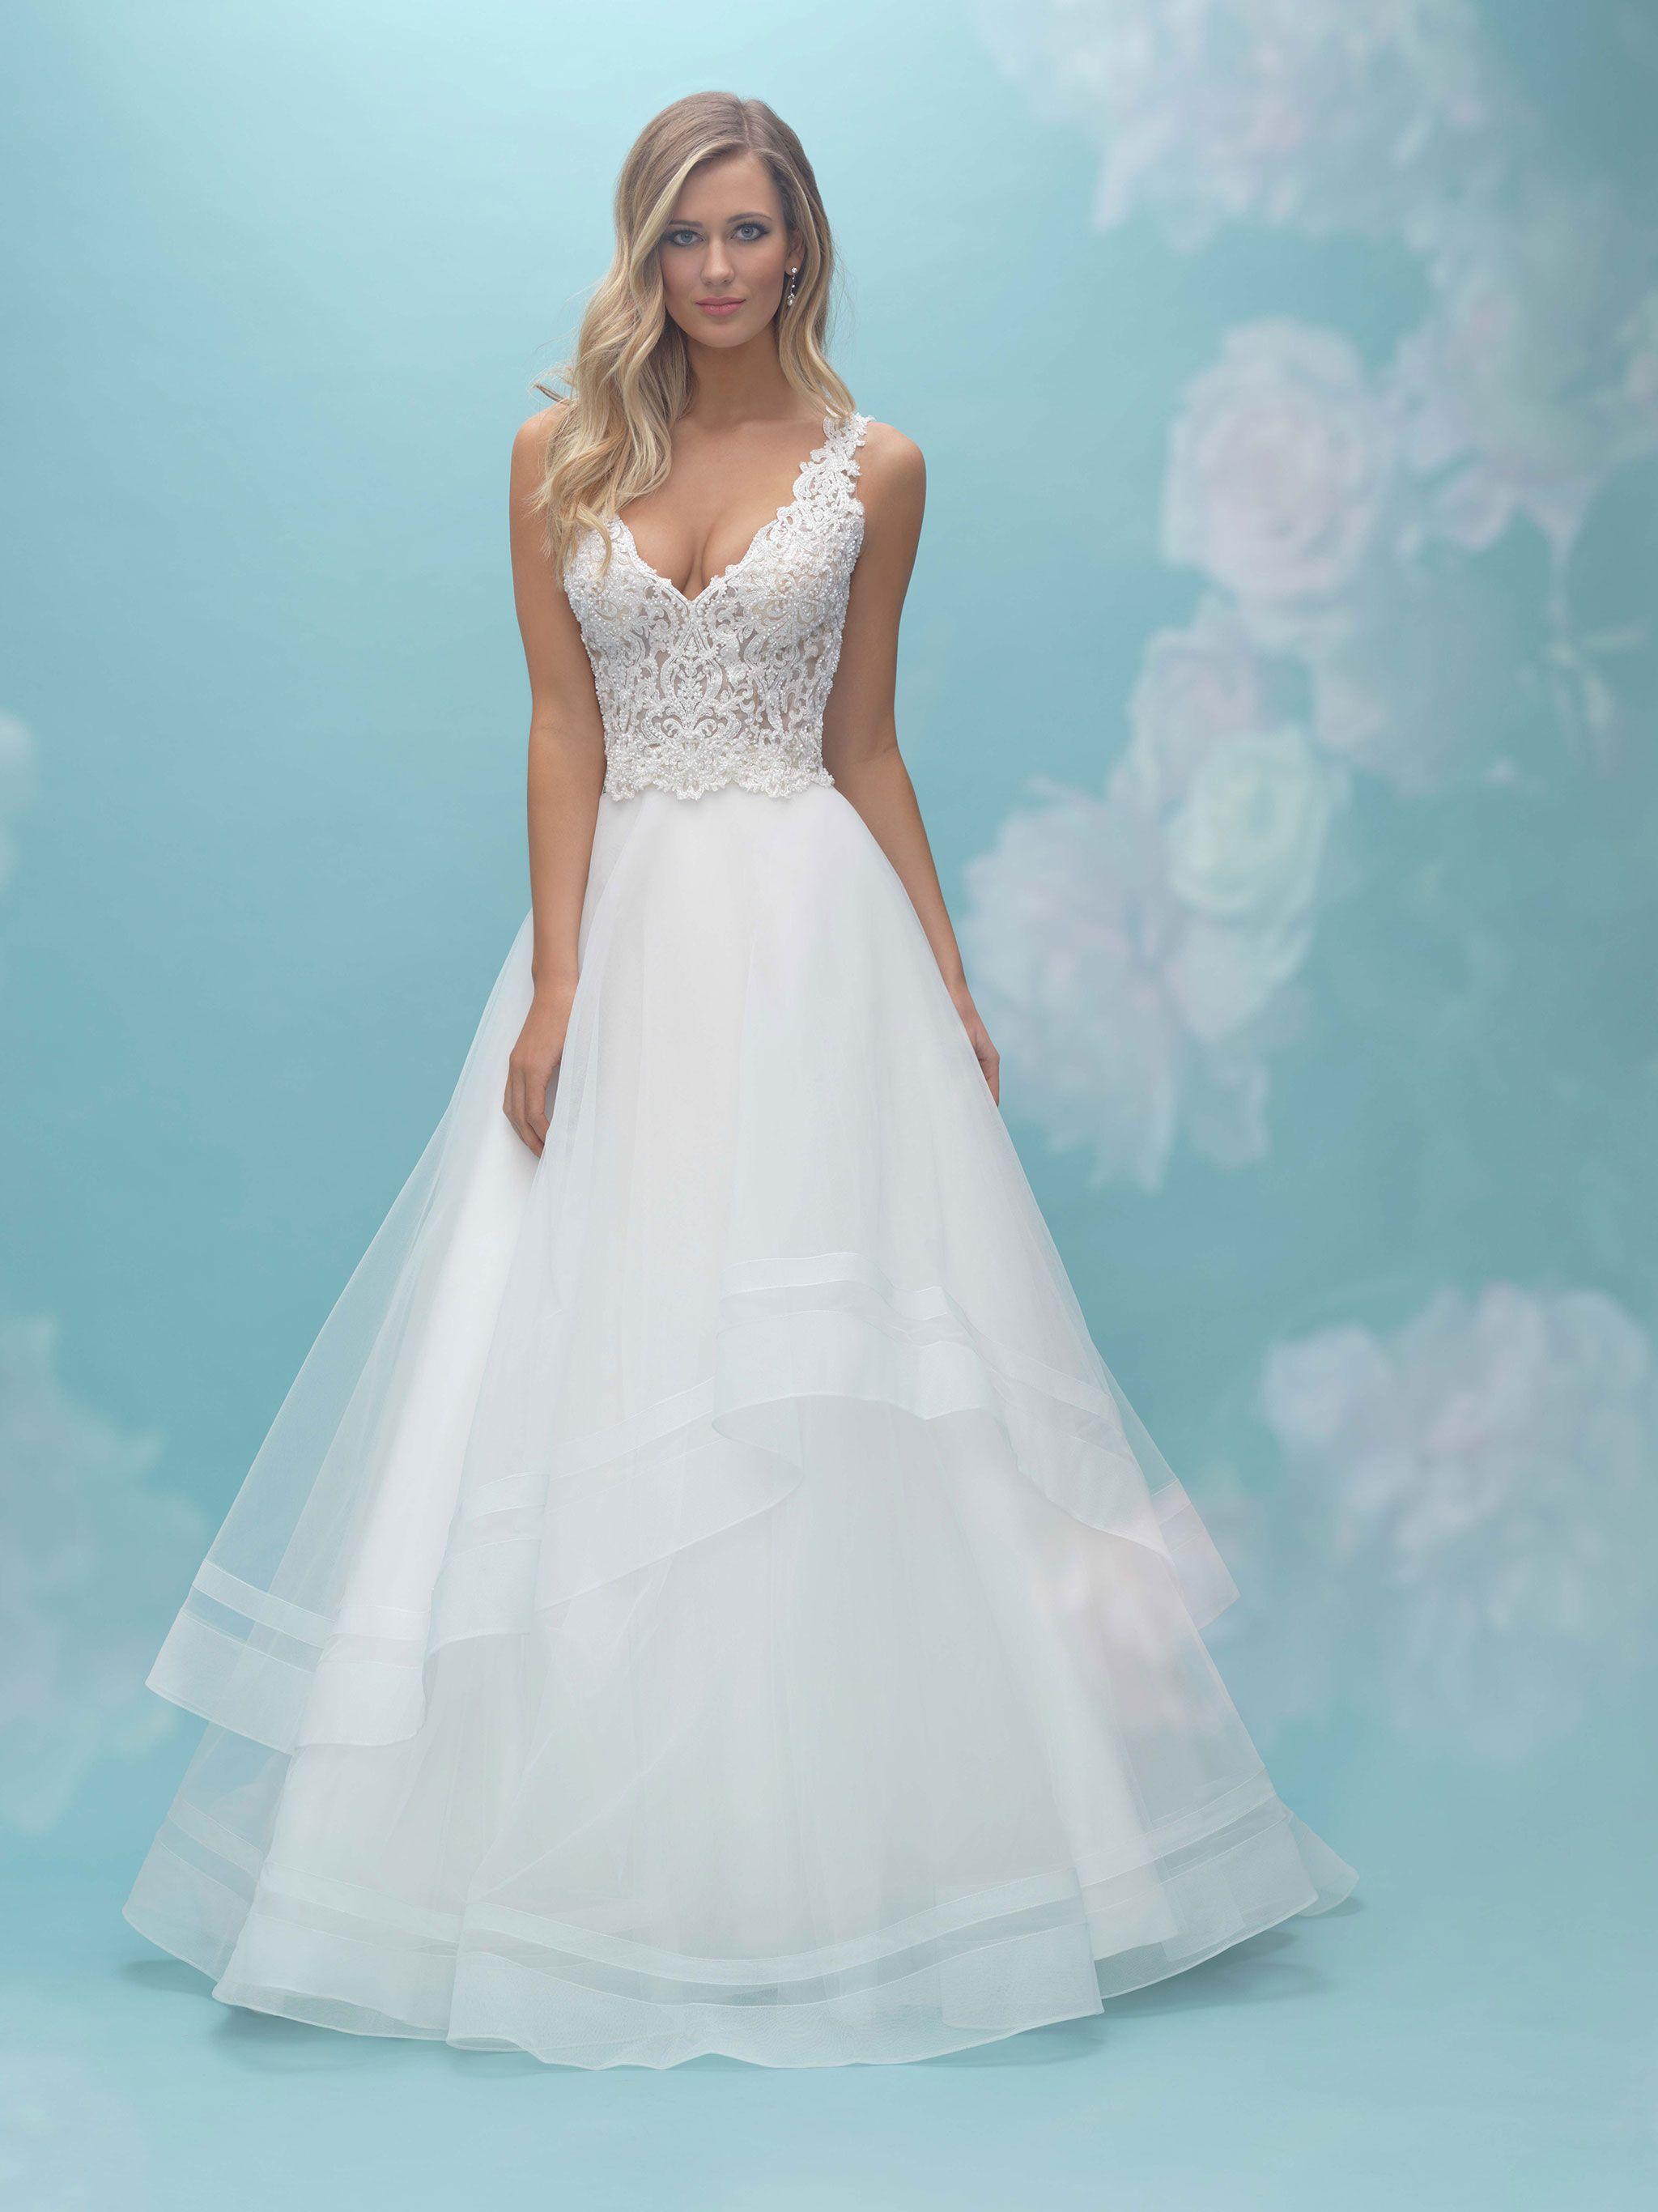 thumbnail   WEDDING   Pinterest   Rehearsal dress, Wedding and ...